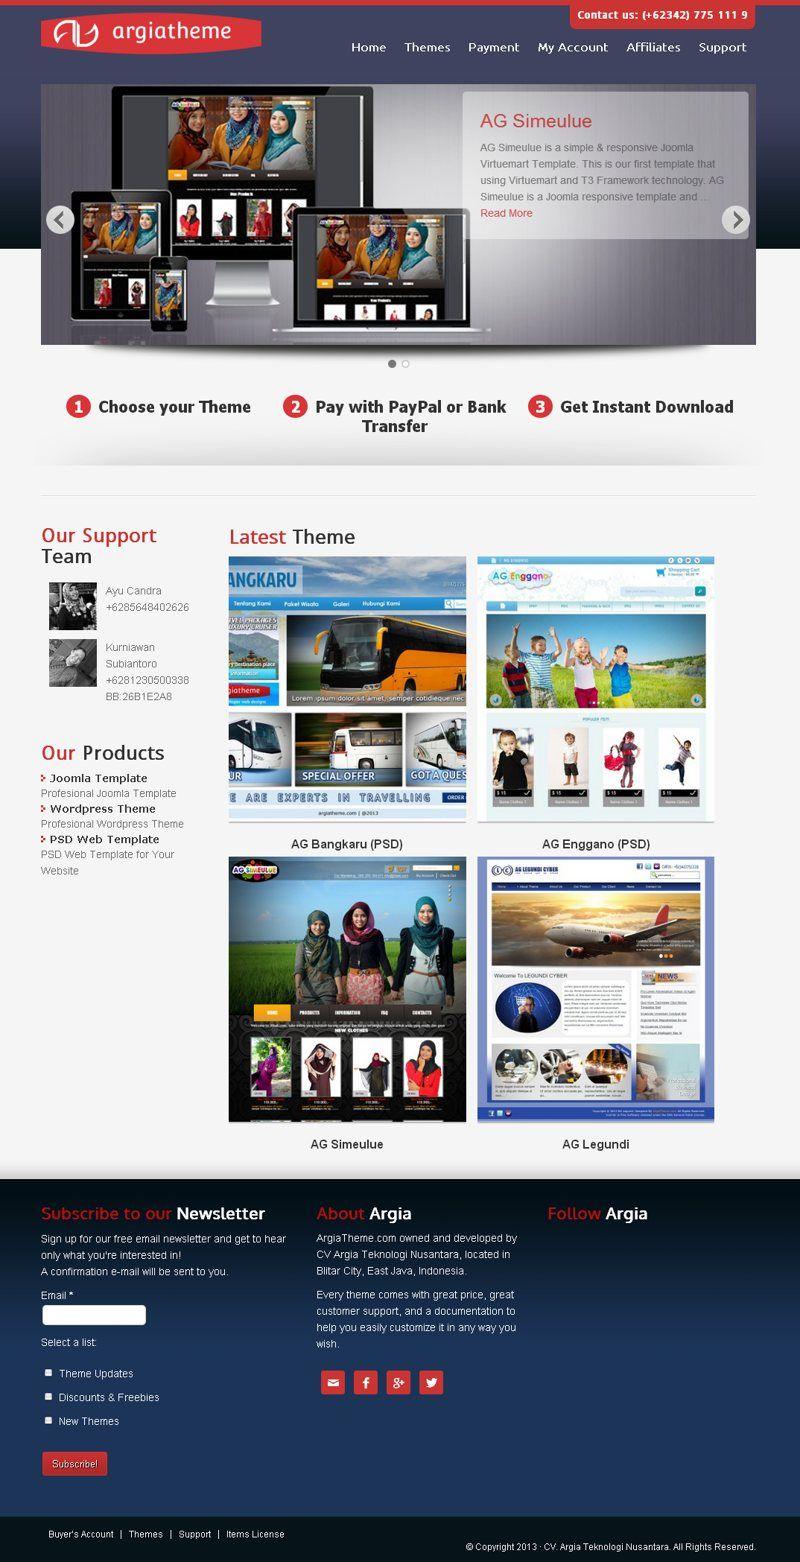 Portofolio Ecommerce Web Toko Online Milik Argiacyber Com Ini